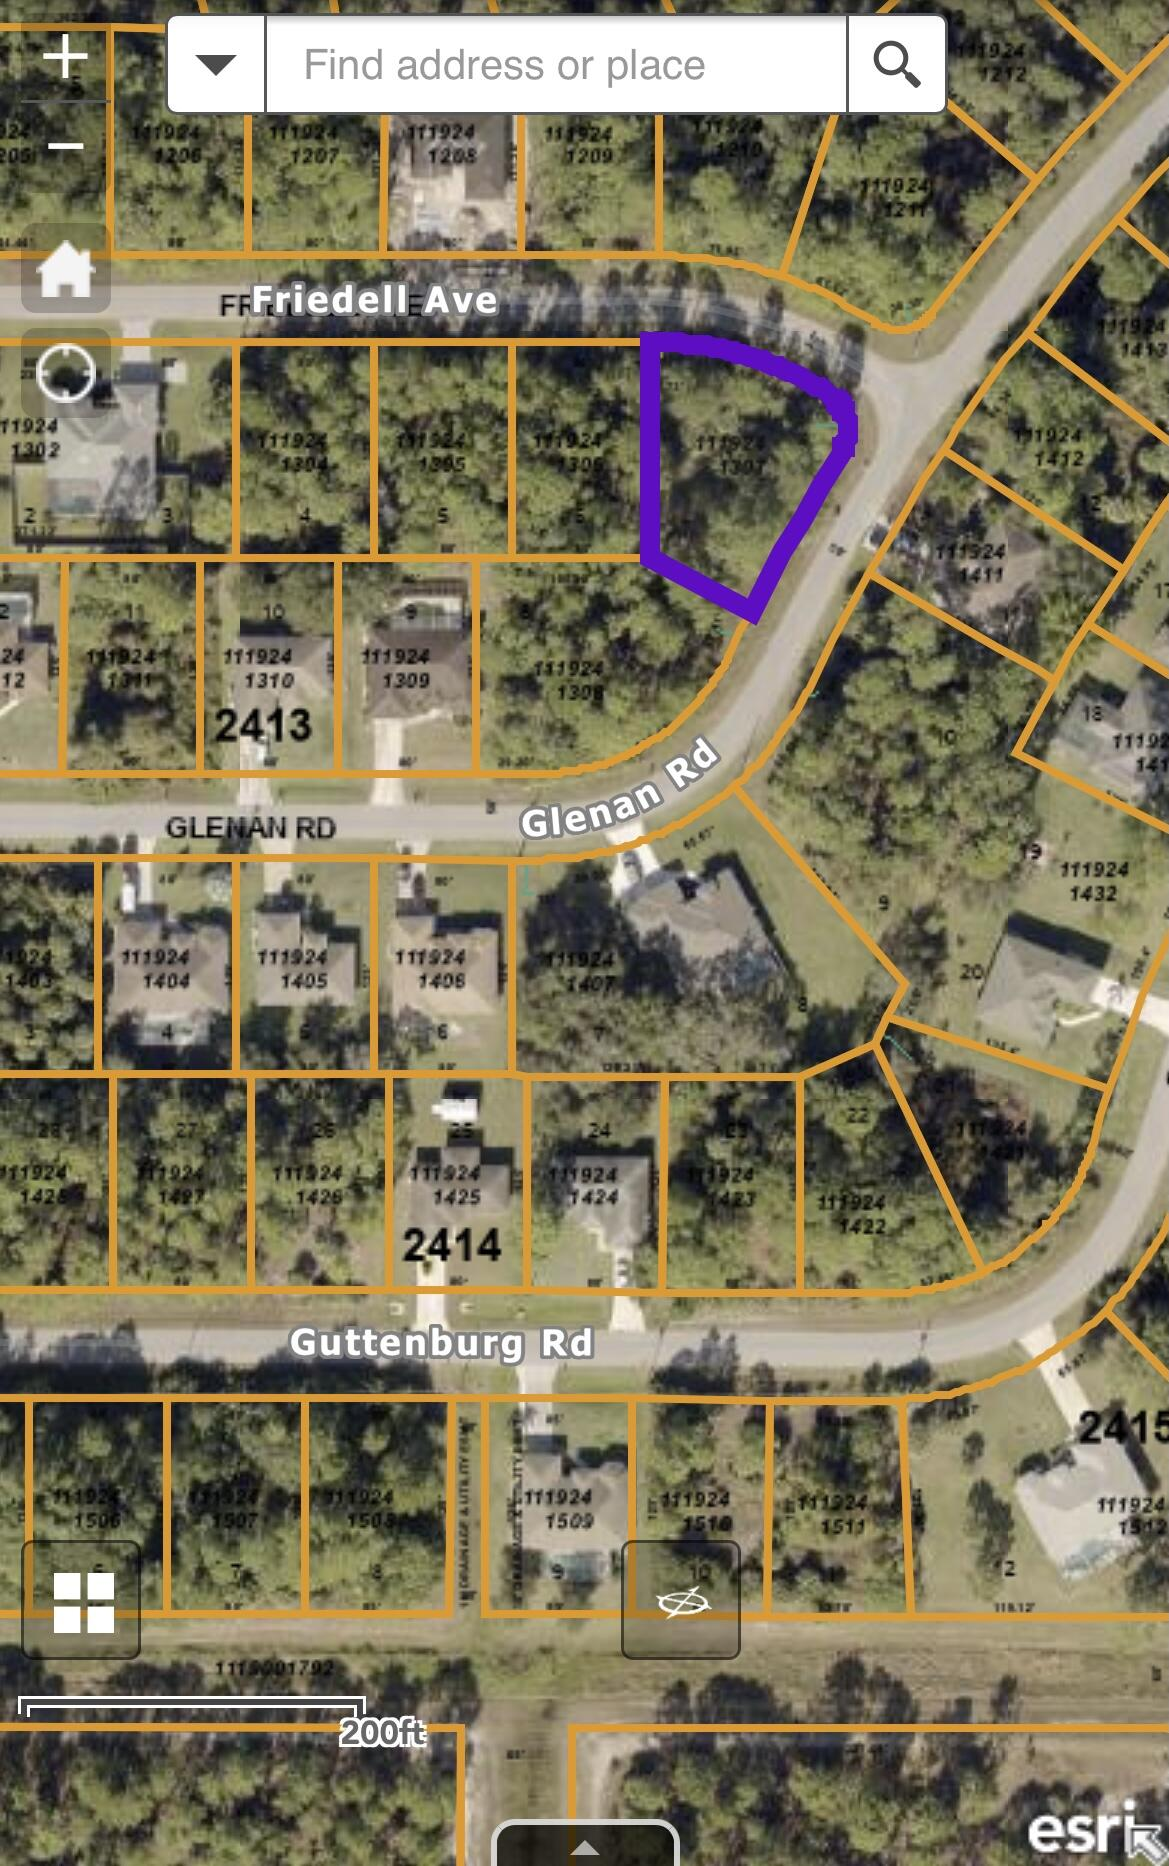 Glenan Rd Map